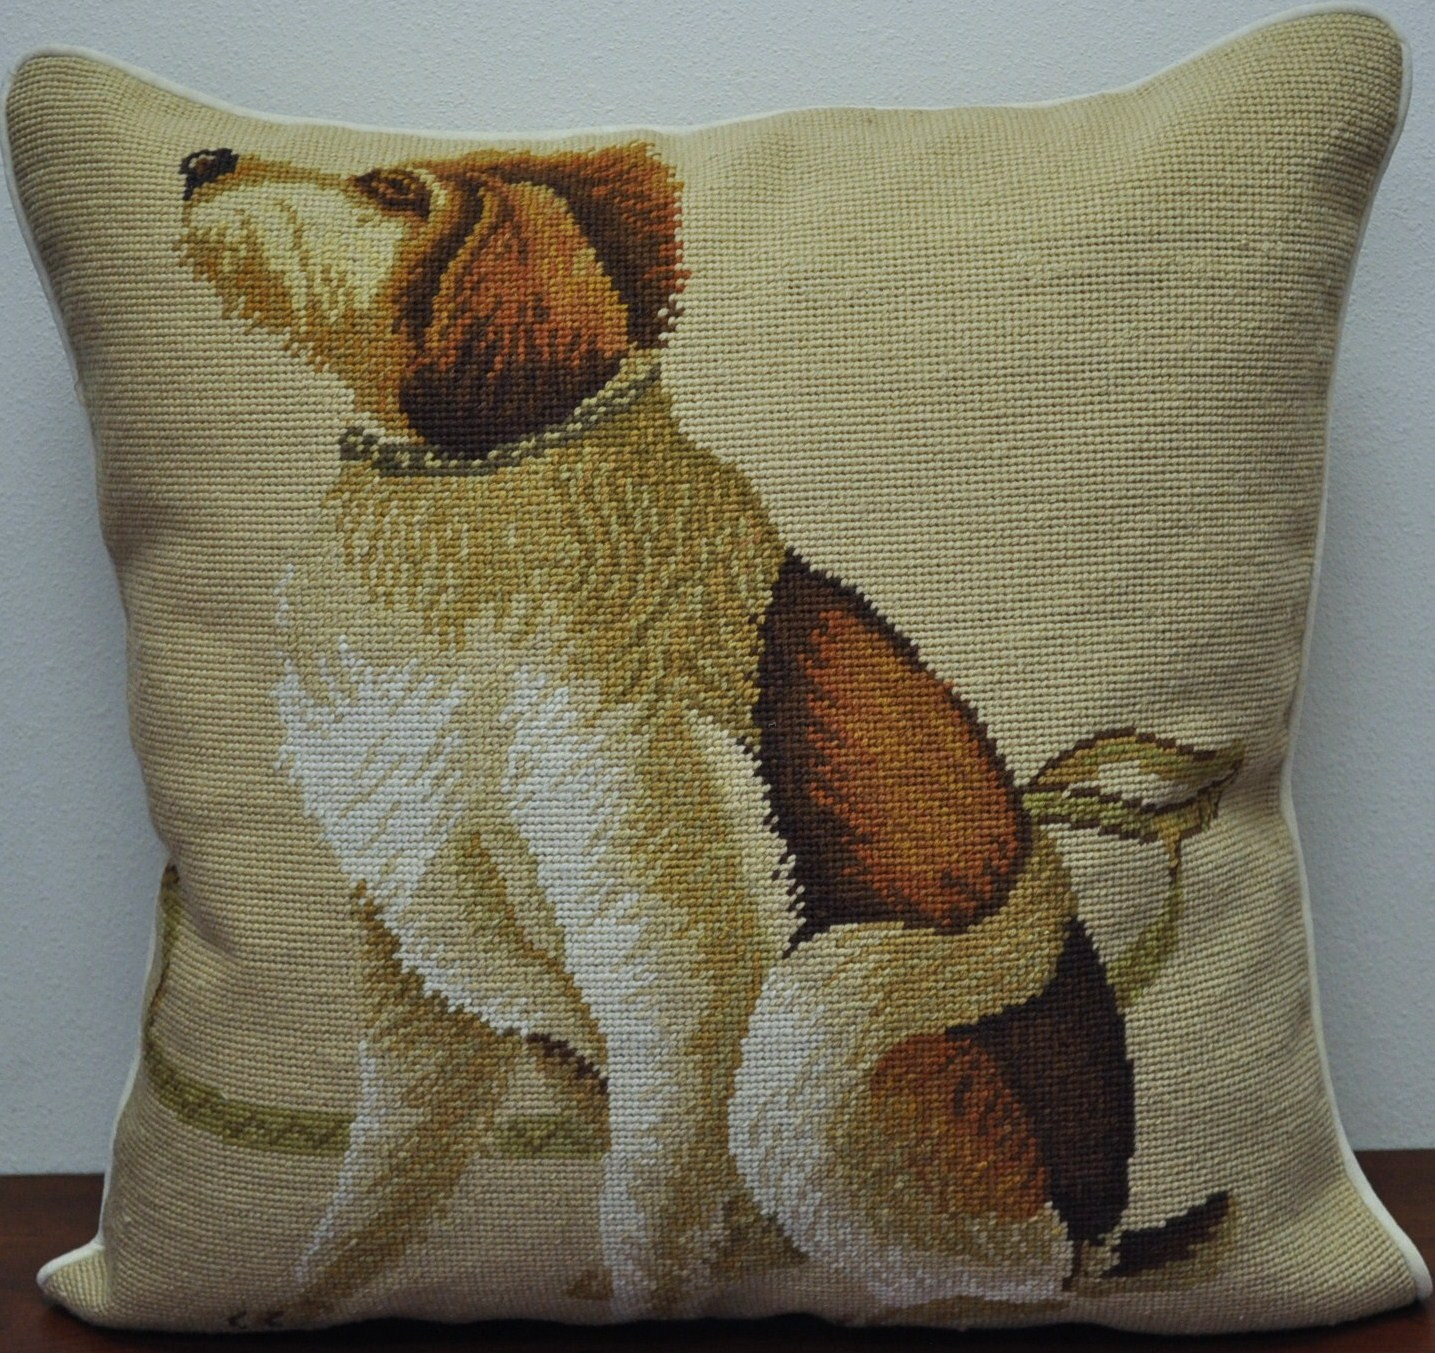 21 x 21 handmade wool needlepoint spinone italiano dog cushion cover pillow case 12980152